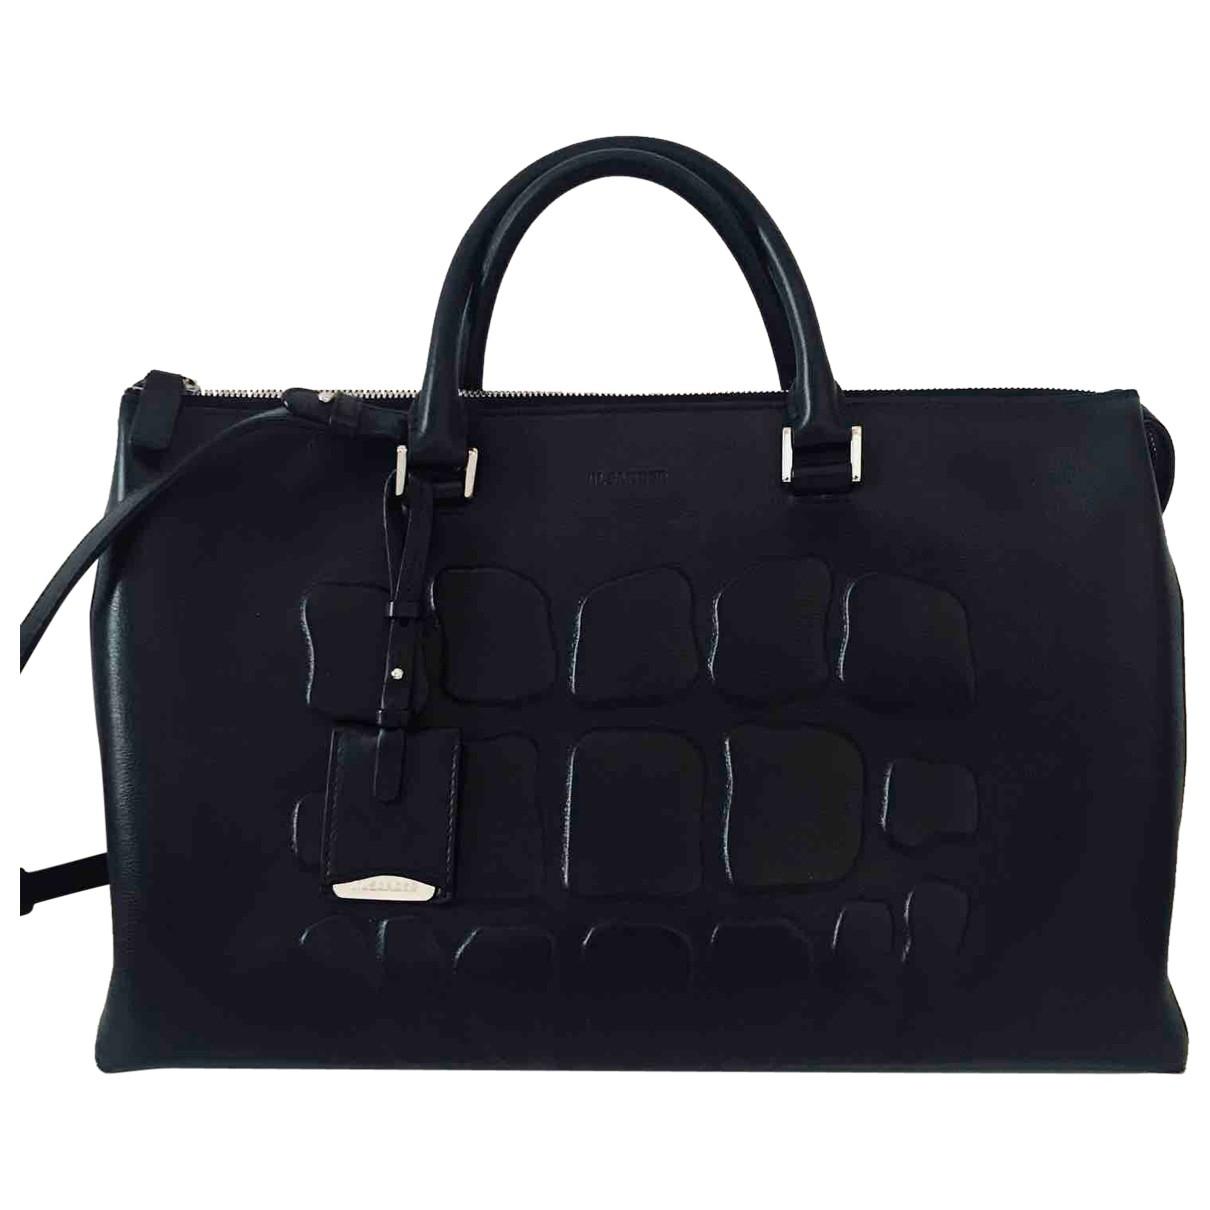 Jil Sander \N Handtasche in  Schwarz Leder